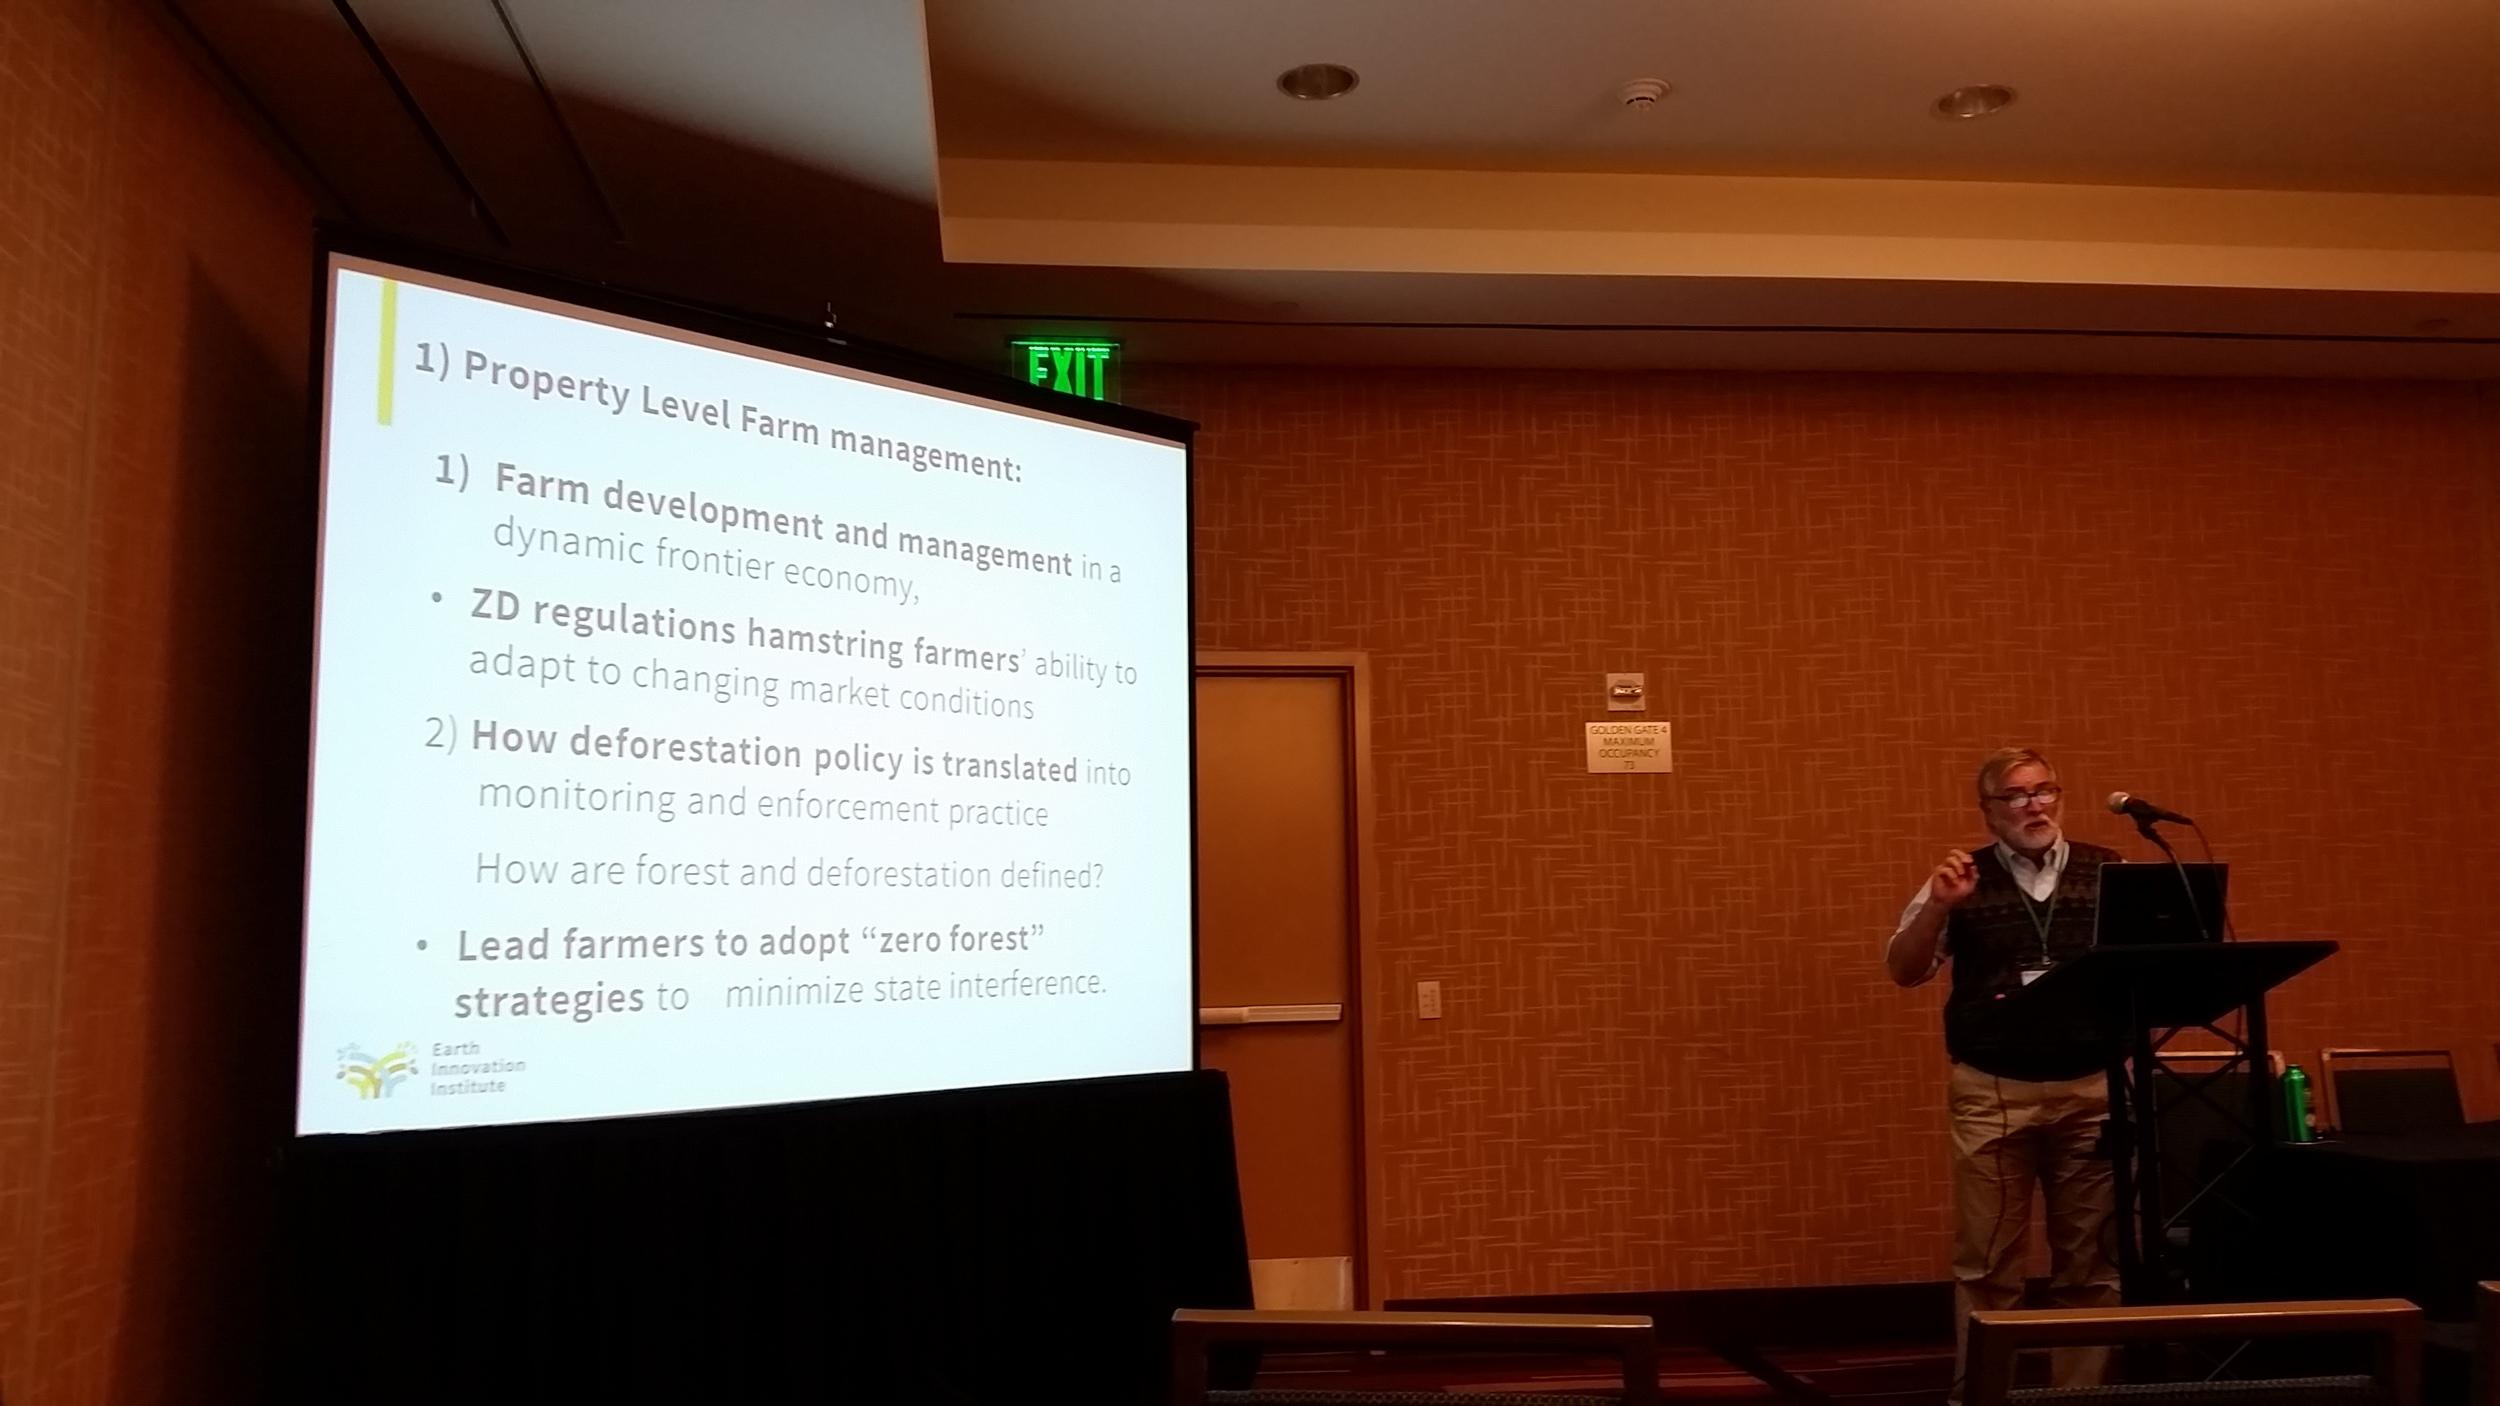 Toby McGrath (EII) discusses the impacts of zero-deforestation policies